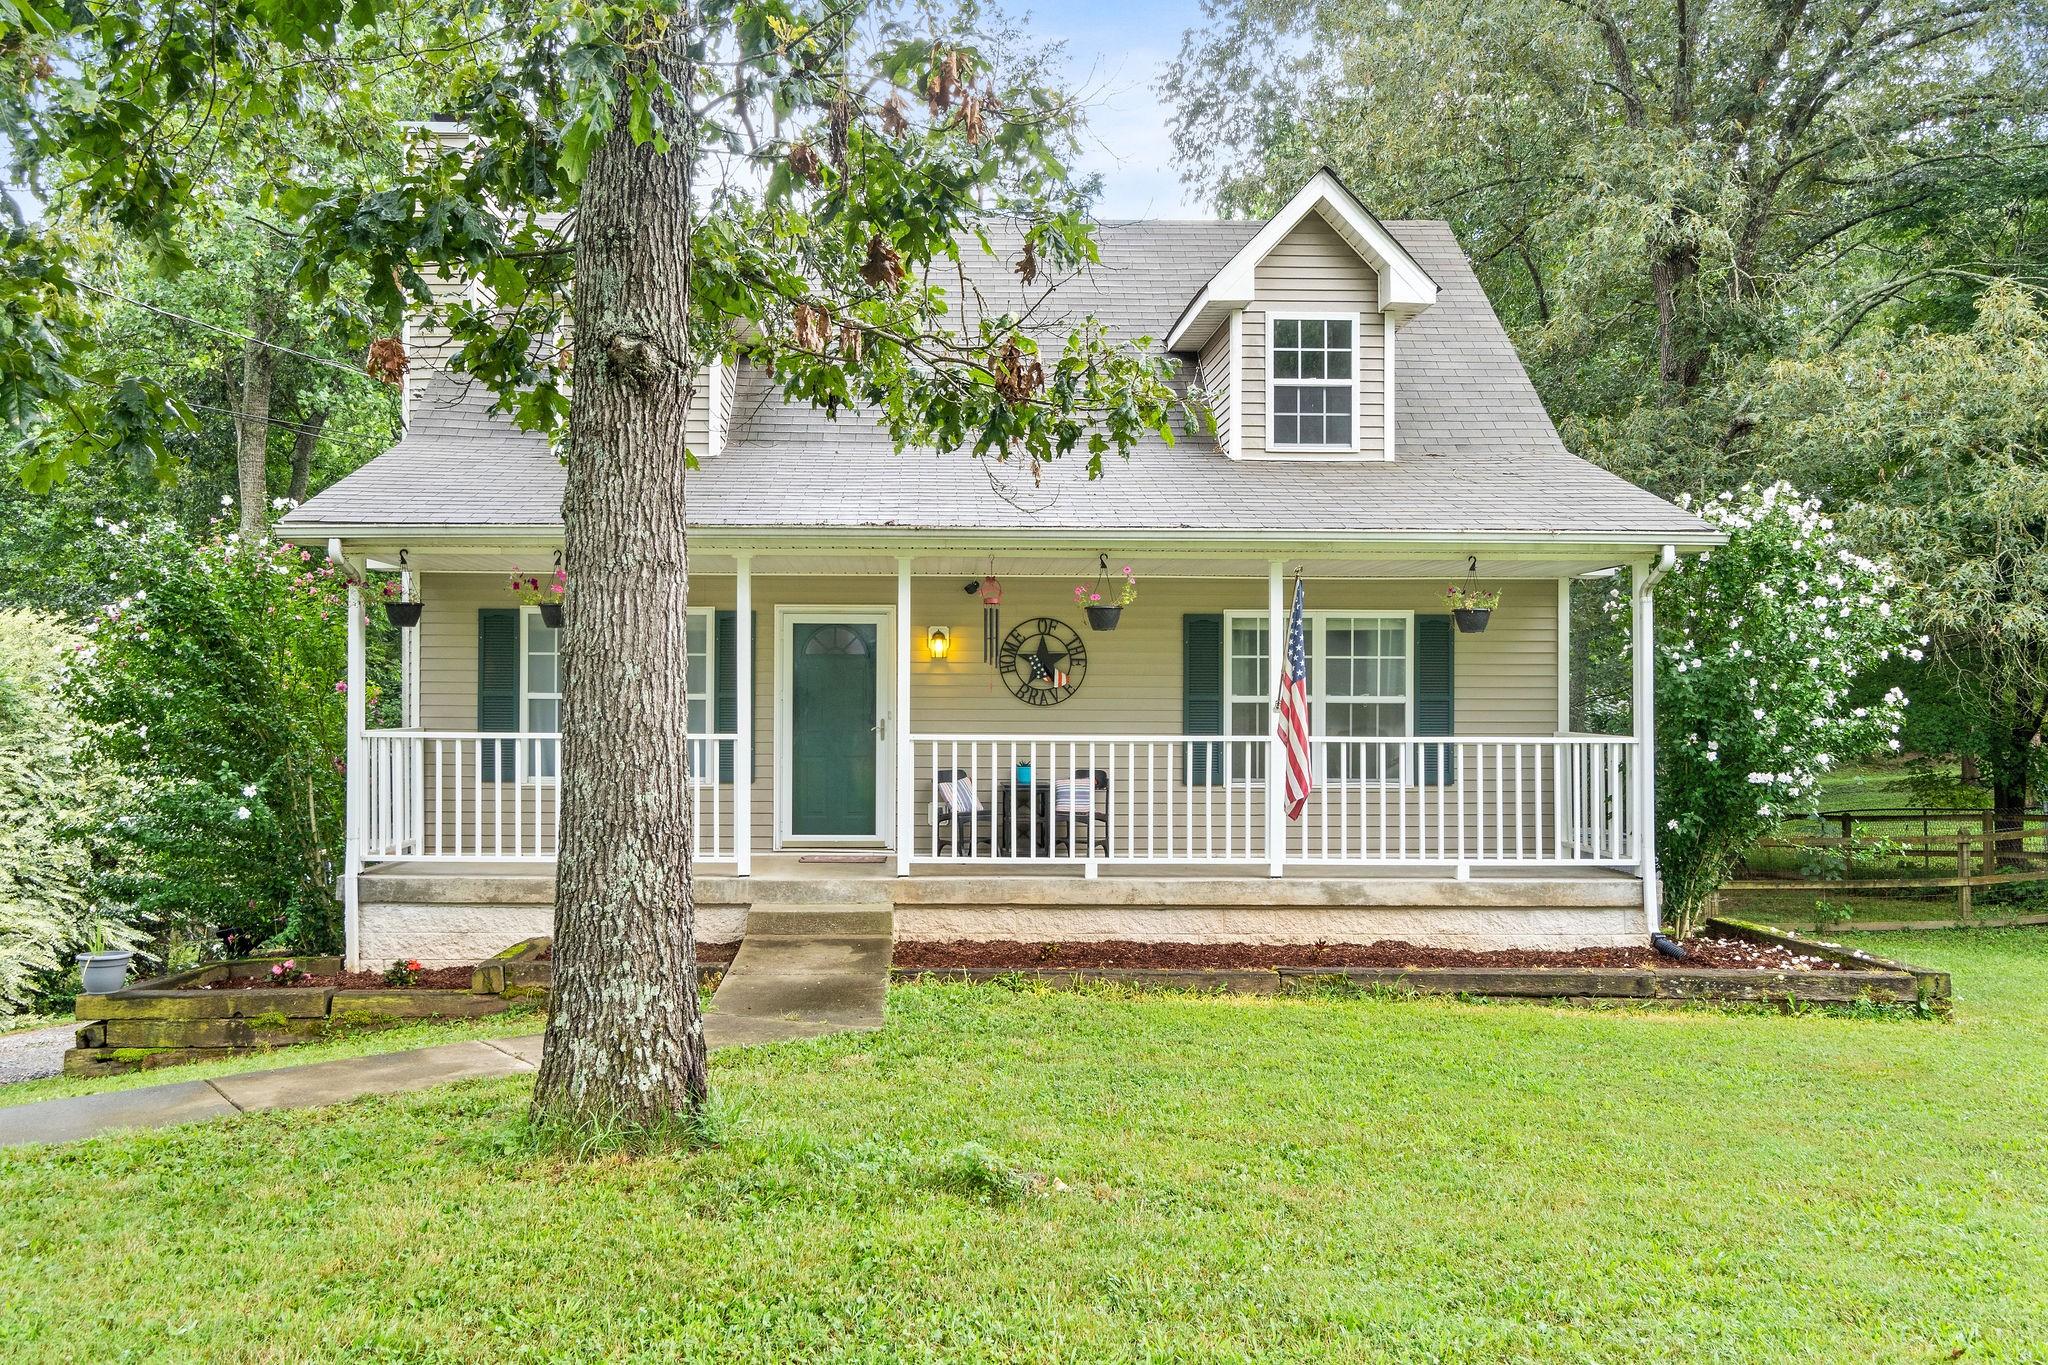 3329 Backridge Rd Property Photo - Woodlawn, TN real estate listing